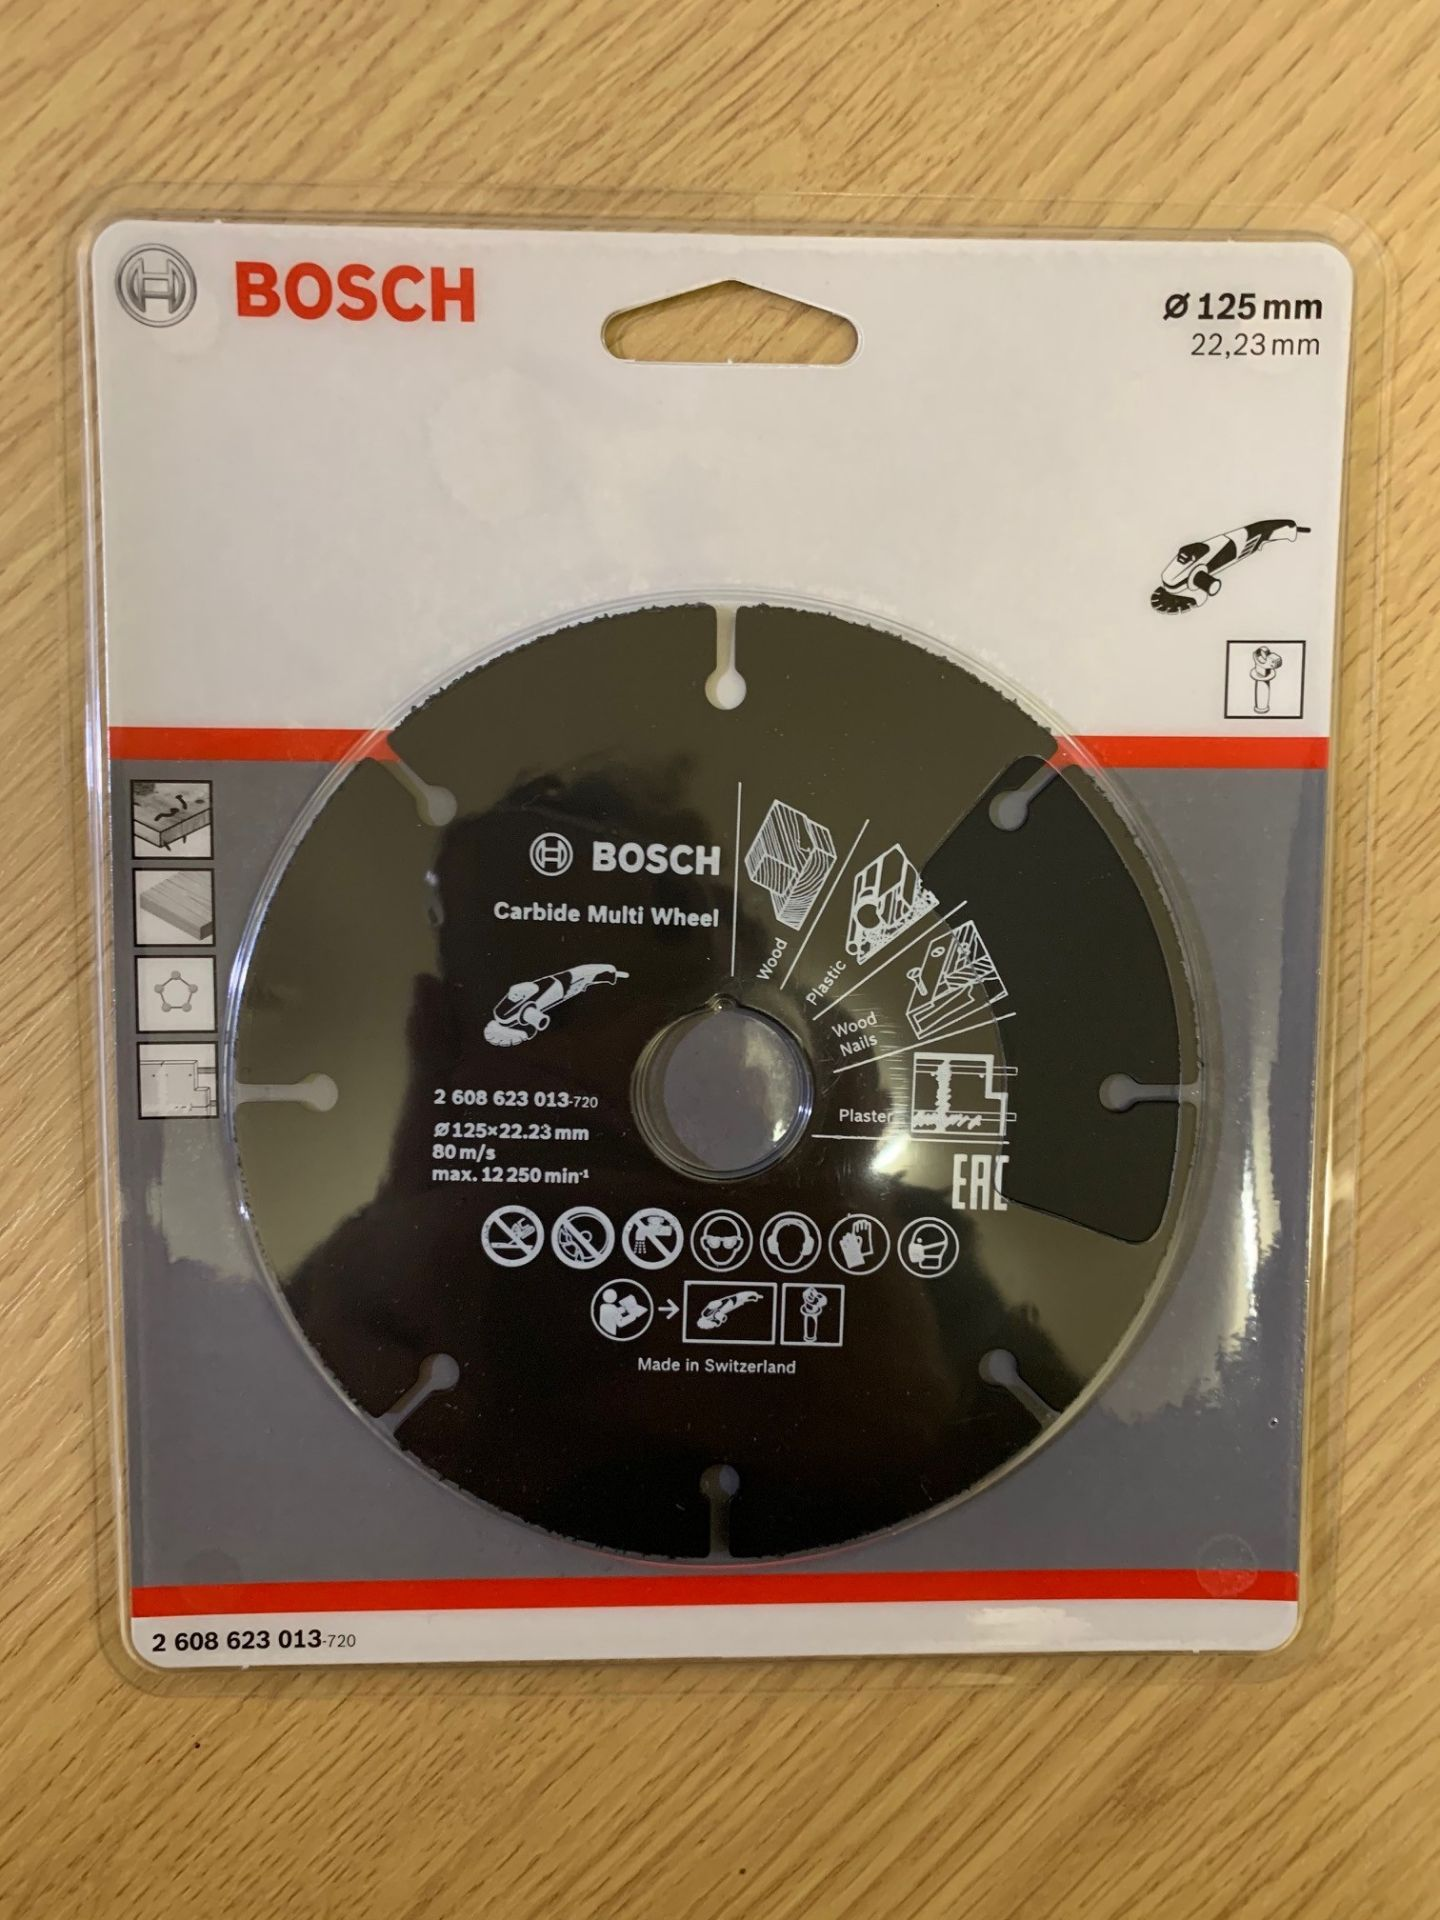 Lot 269 - 5 x Bosch 125mm Carbide Multi Wheels - Brand New